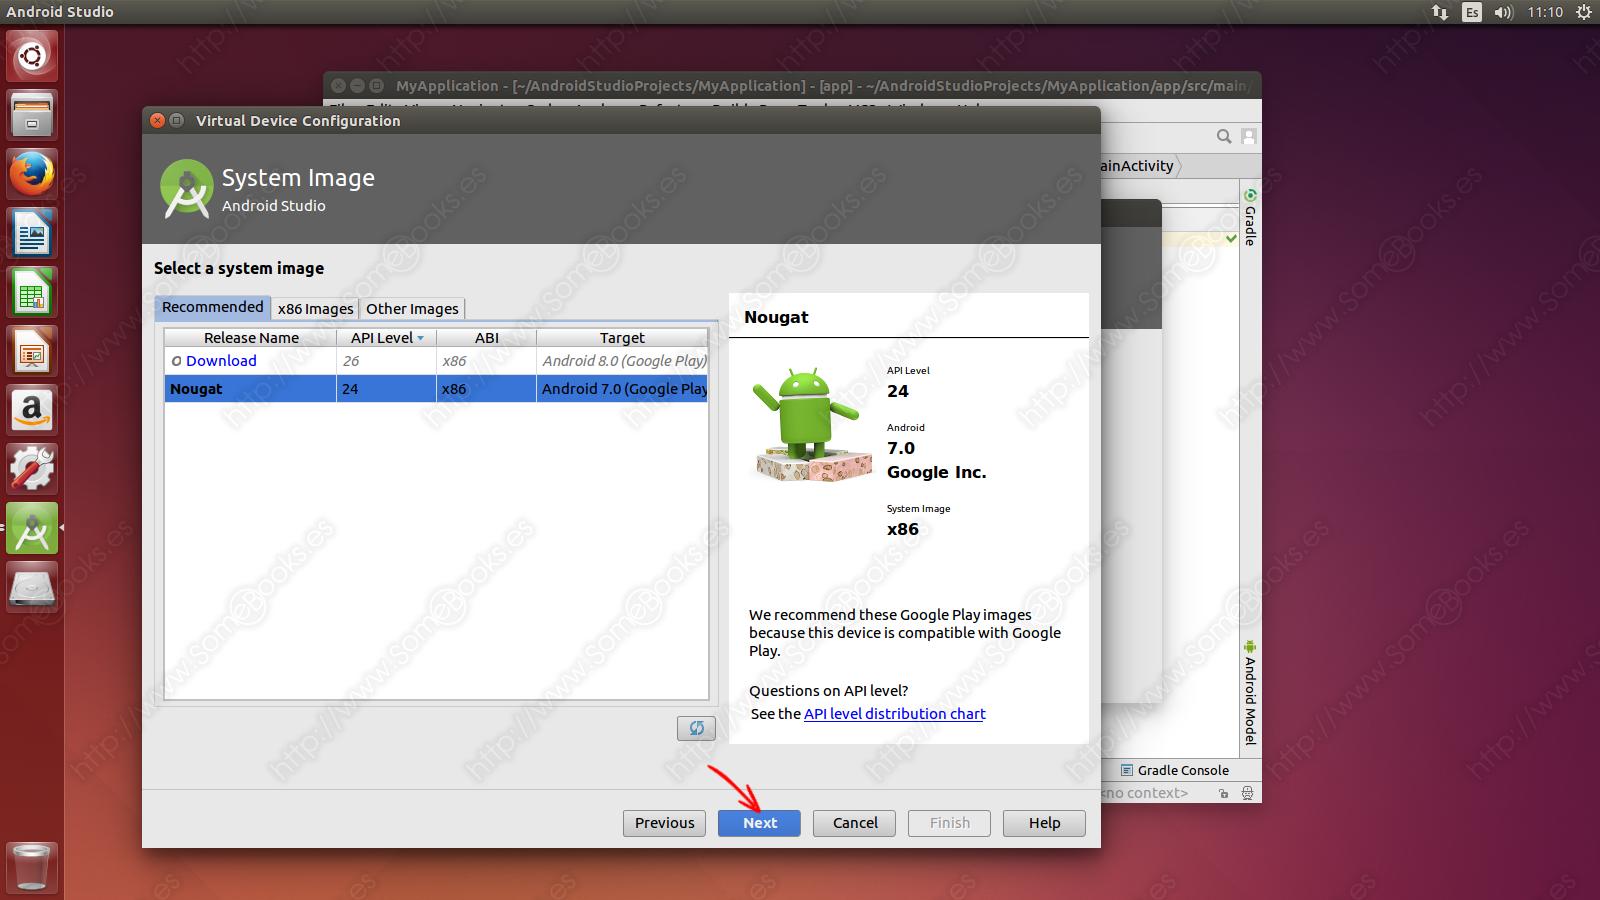 Crear-un-emulador-de-Android-con-Android-Studio-009